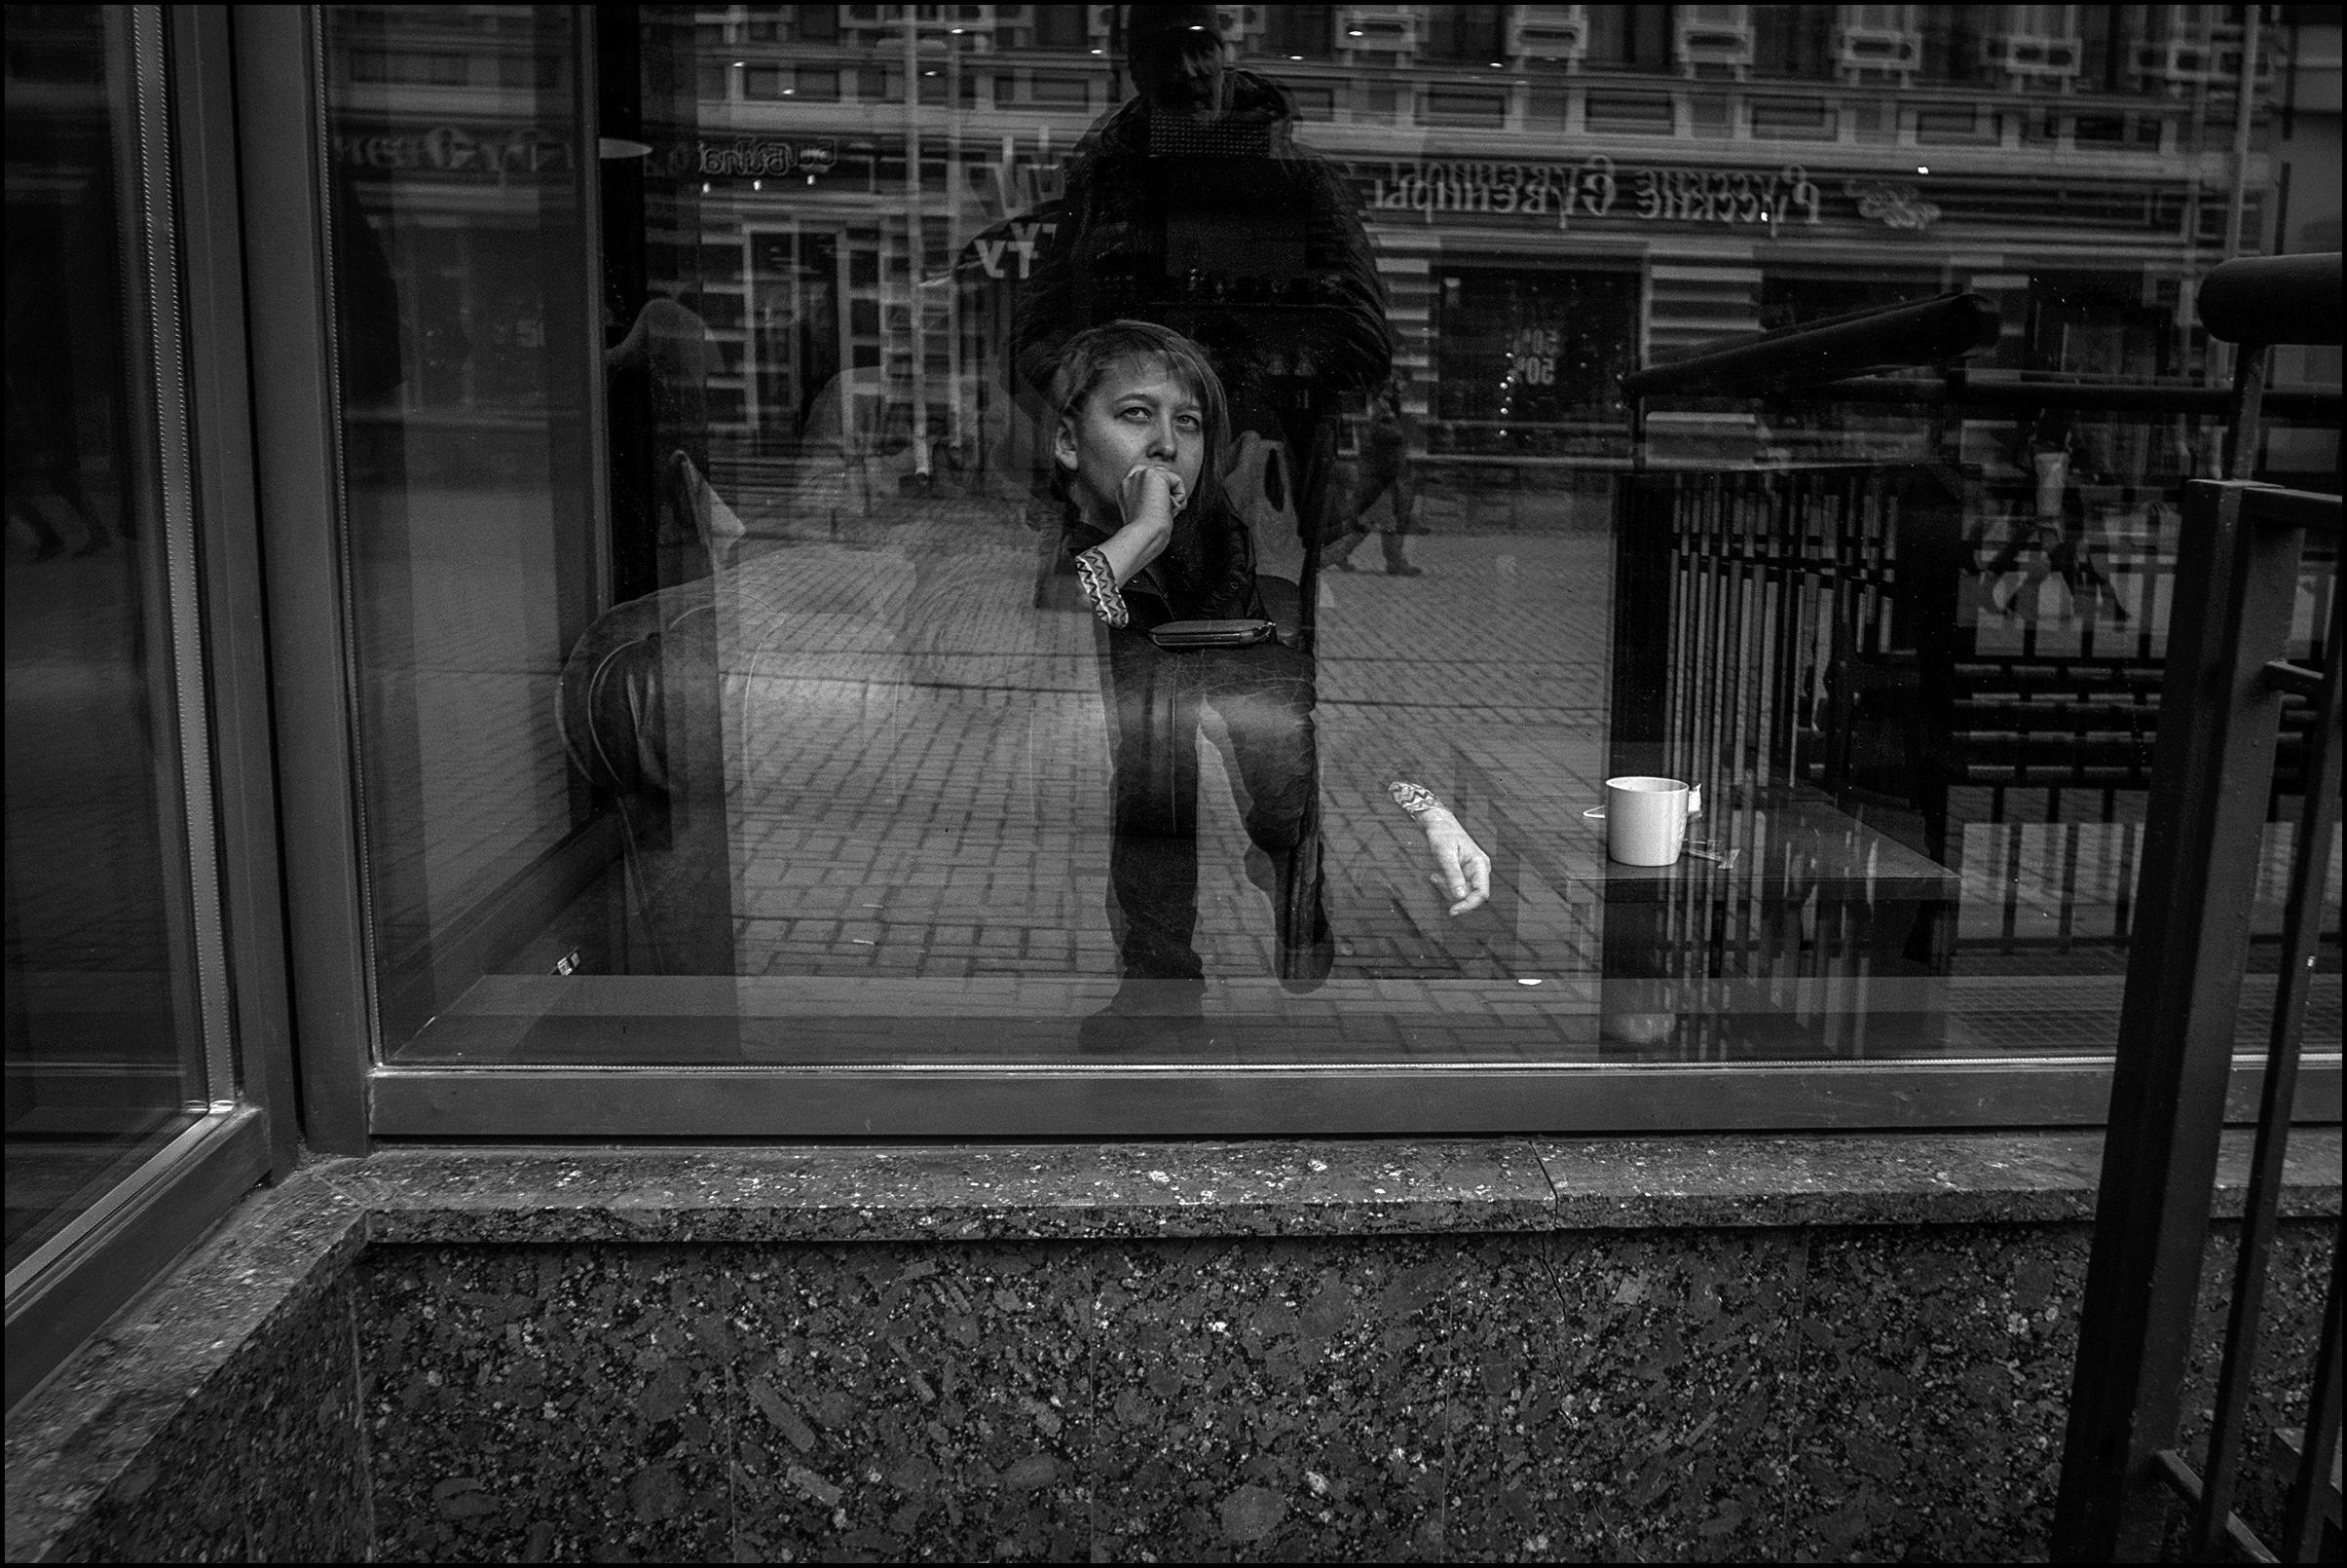 фото мужчина на стаканом ночь окнам москва вам всё равно